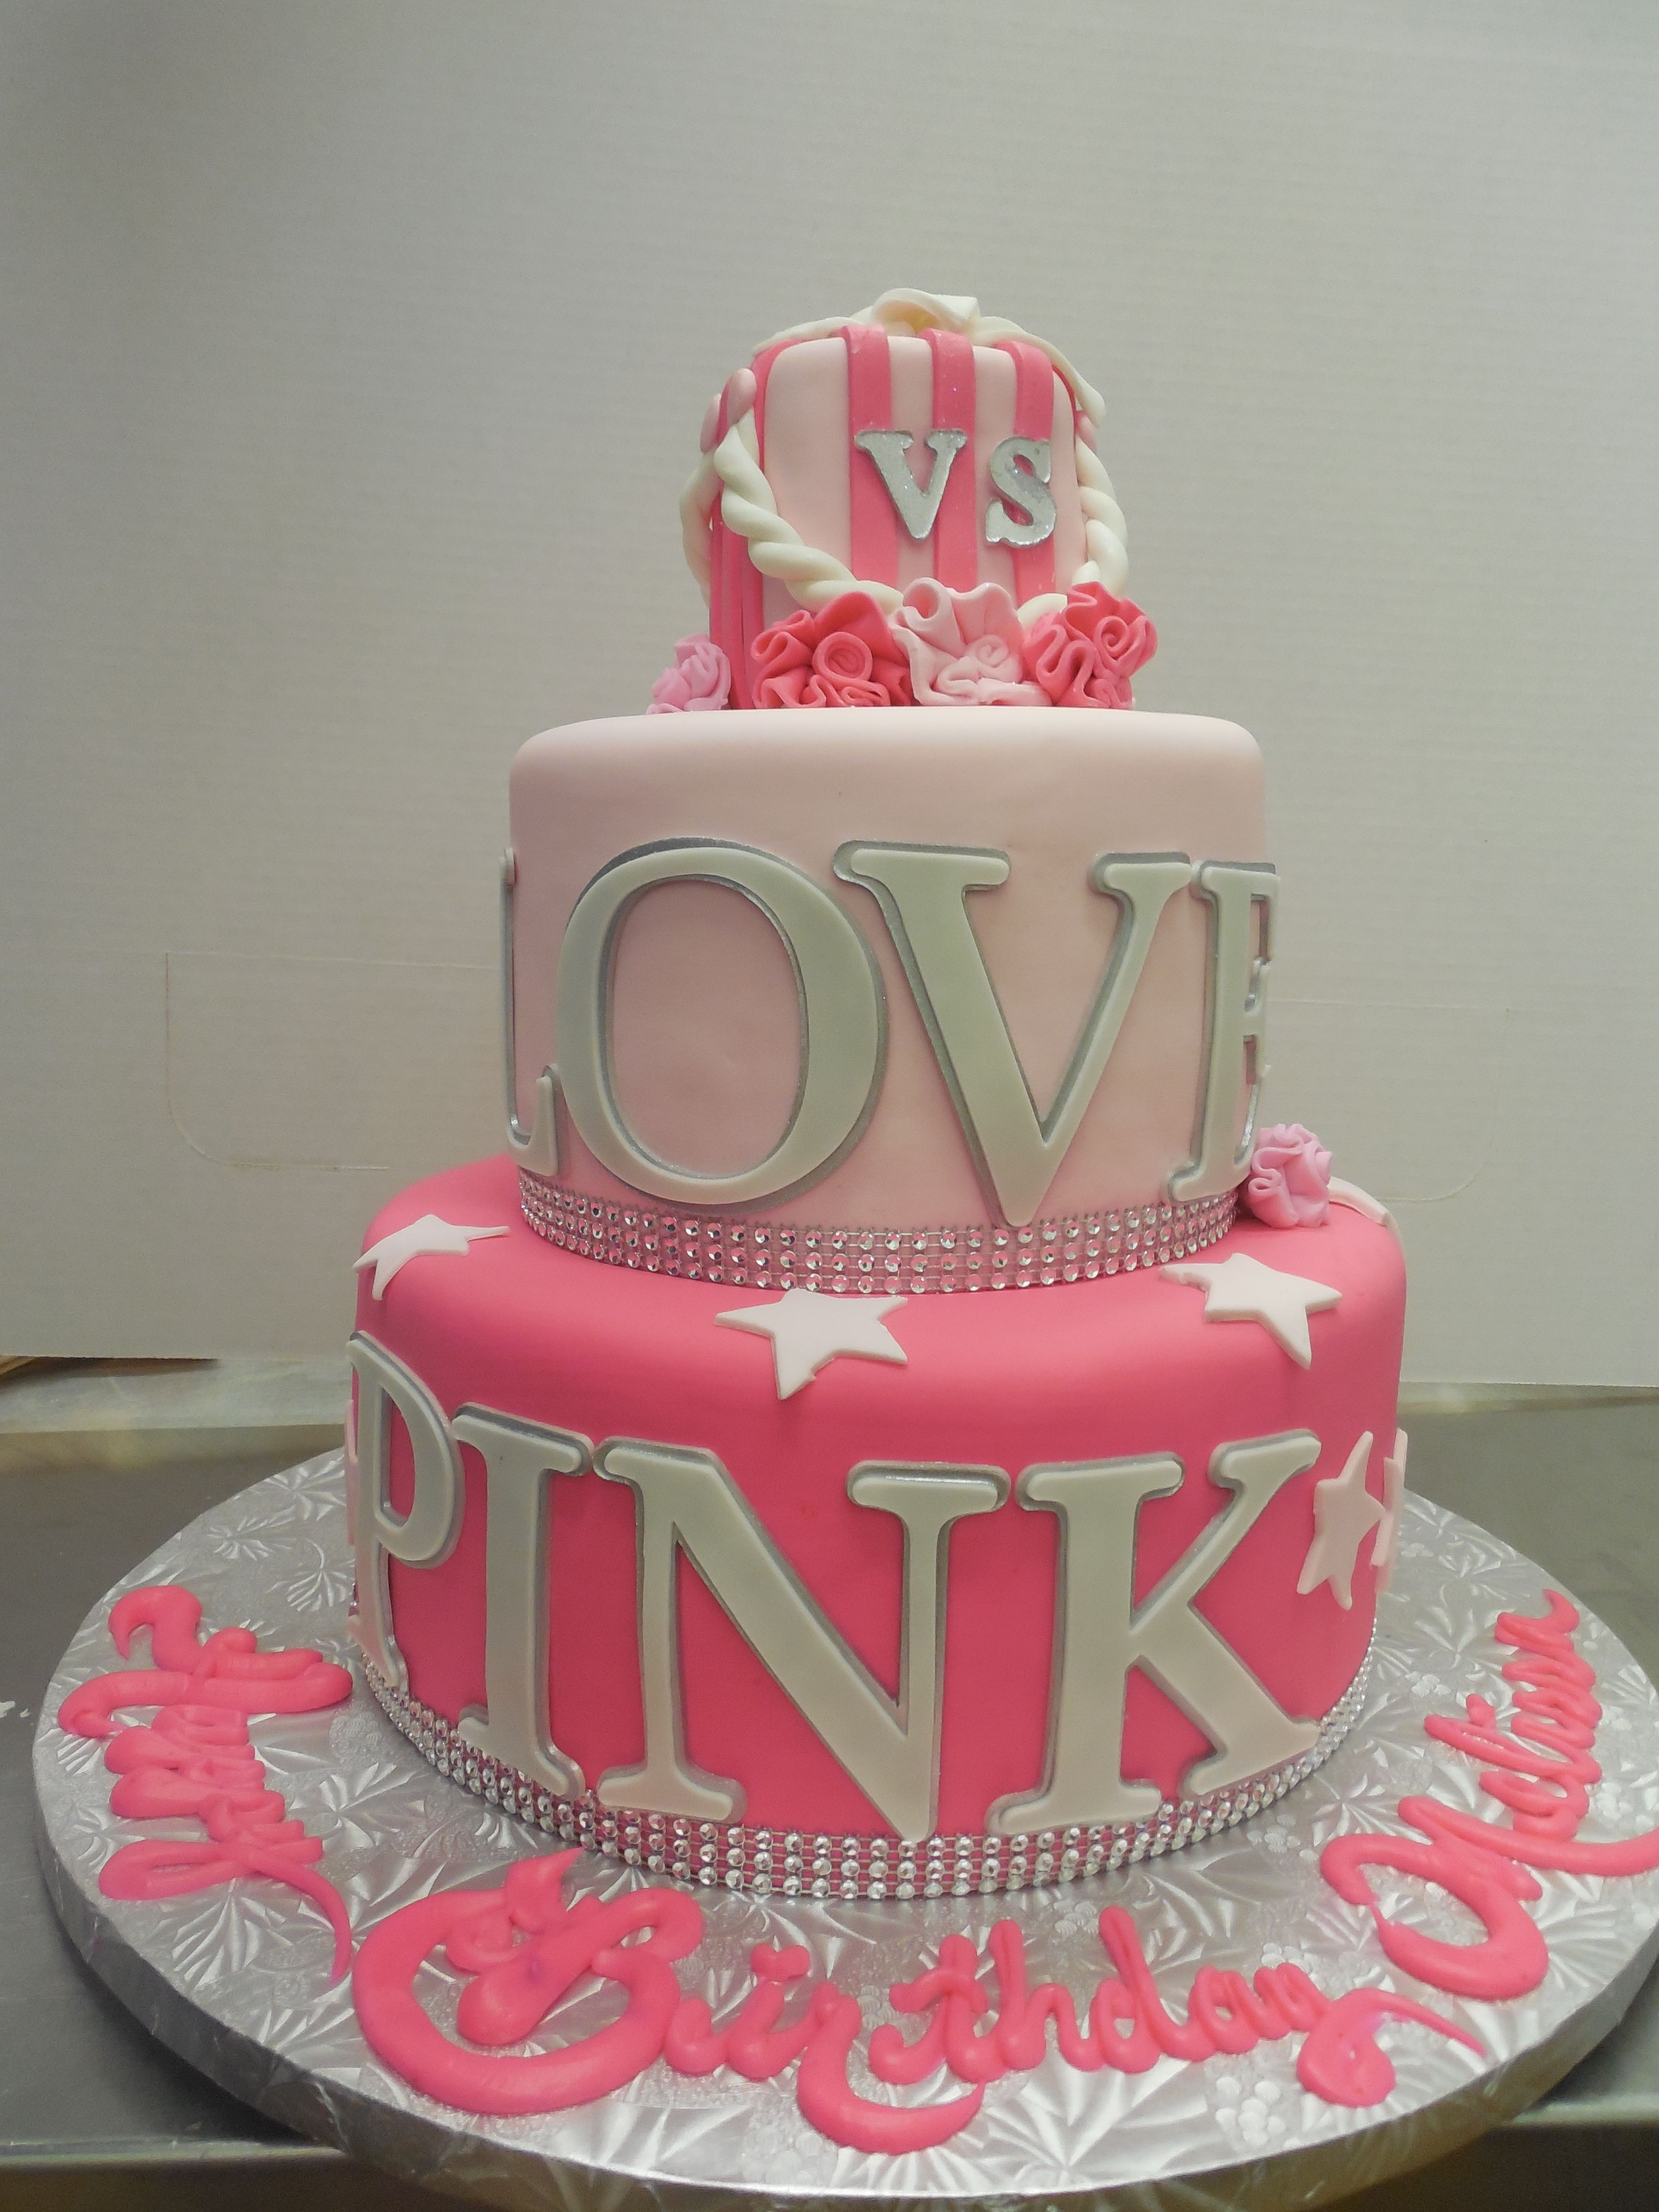 Calumet Bakery Love Pink Vs Birthday Cake Fondant Birthday Cakes